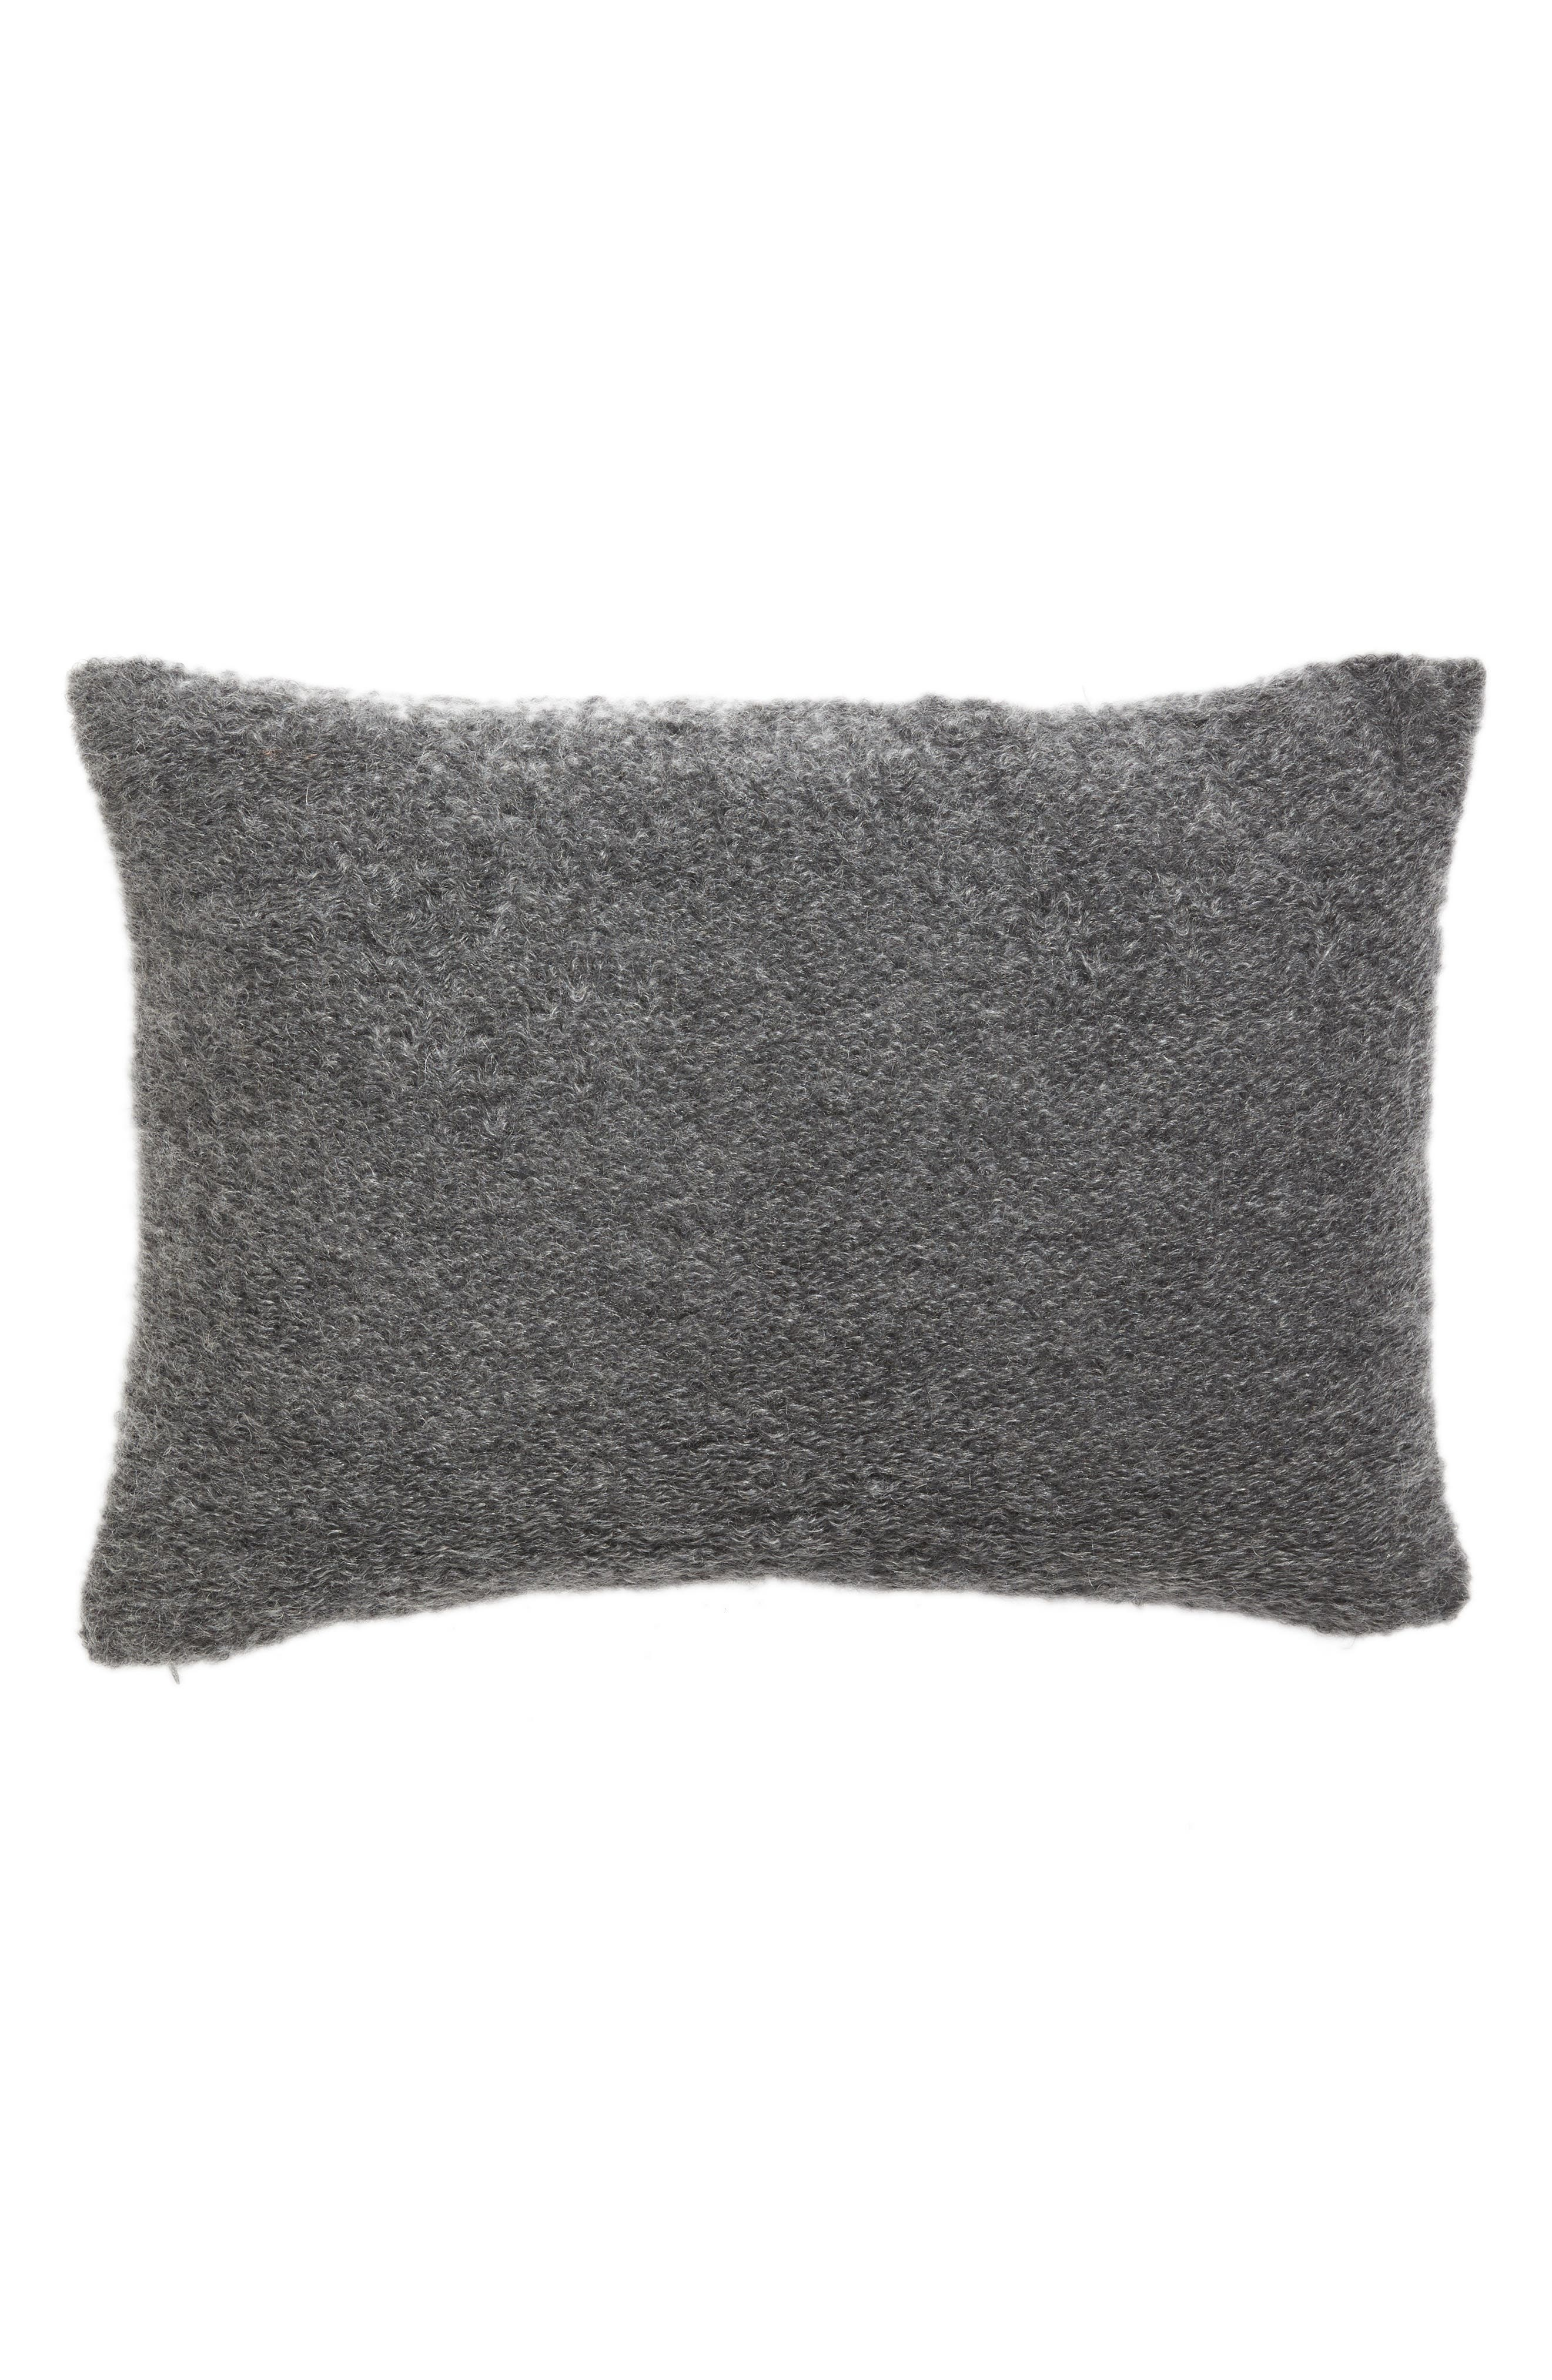 Collio Pillow,                             Alternate thumbnail 2, color,                             GRAPHITE